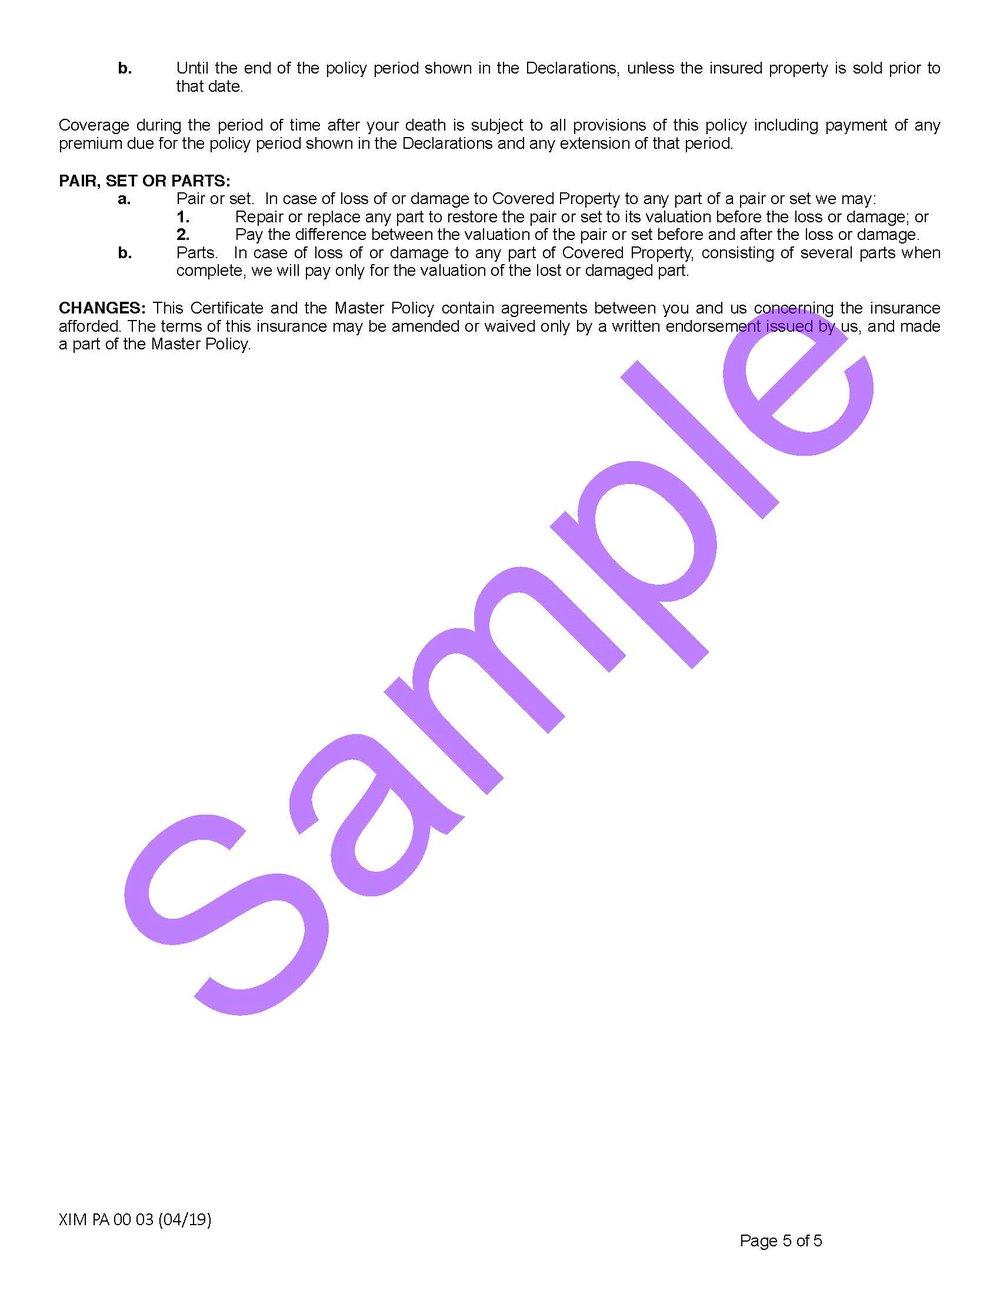 XIM PA 00 03 04 19 Pennsylvania Certificate of InsuranceSample_Page_5.jpg